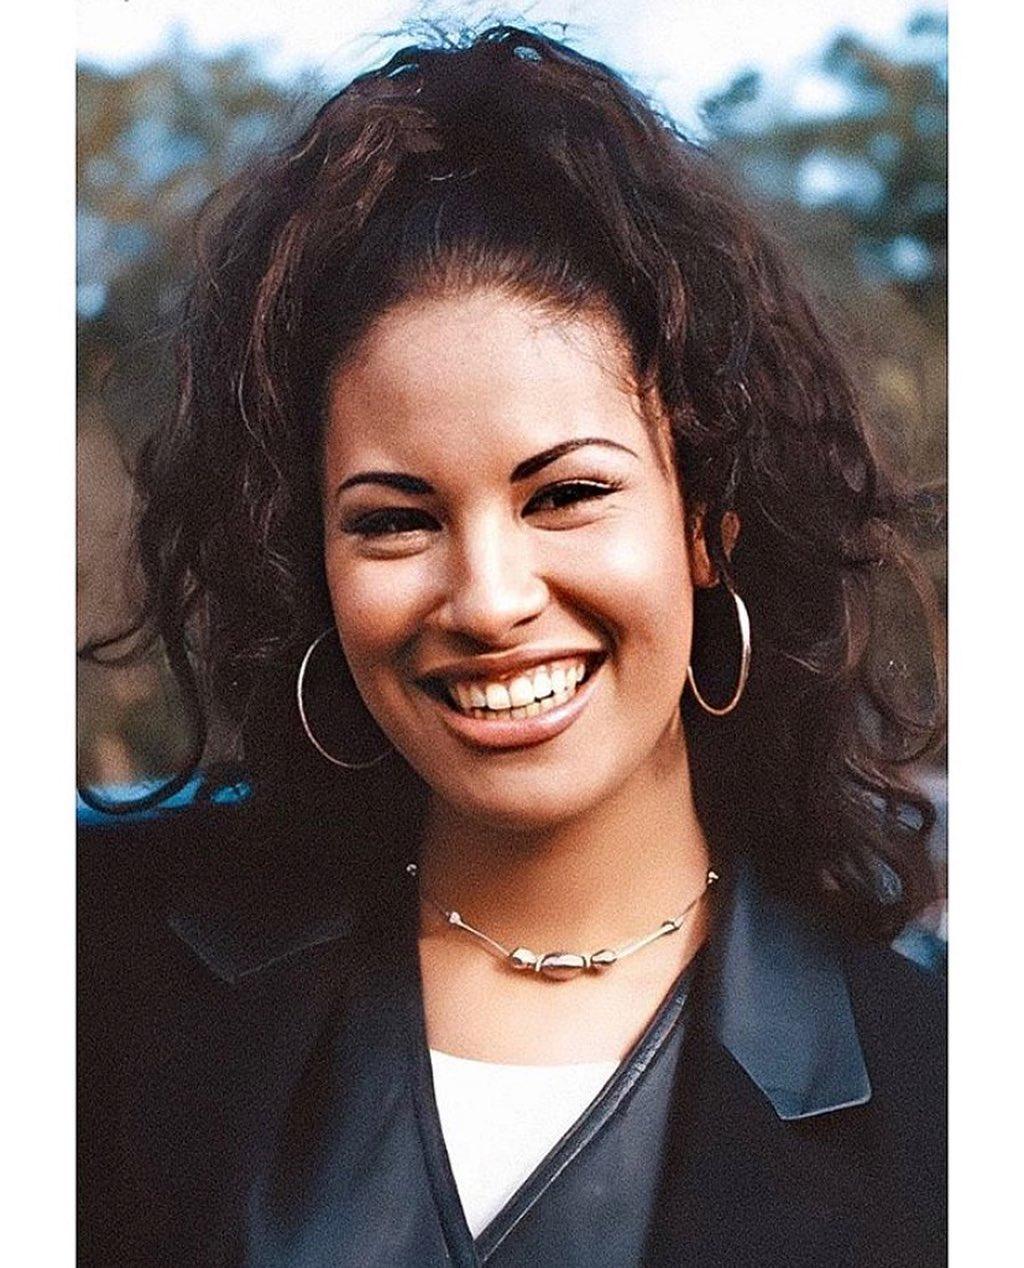 A. B. Quintanilla recuerda a Selena con foto inédita